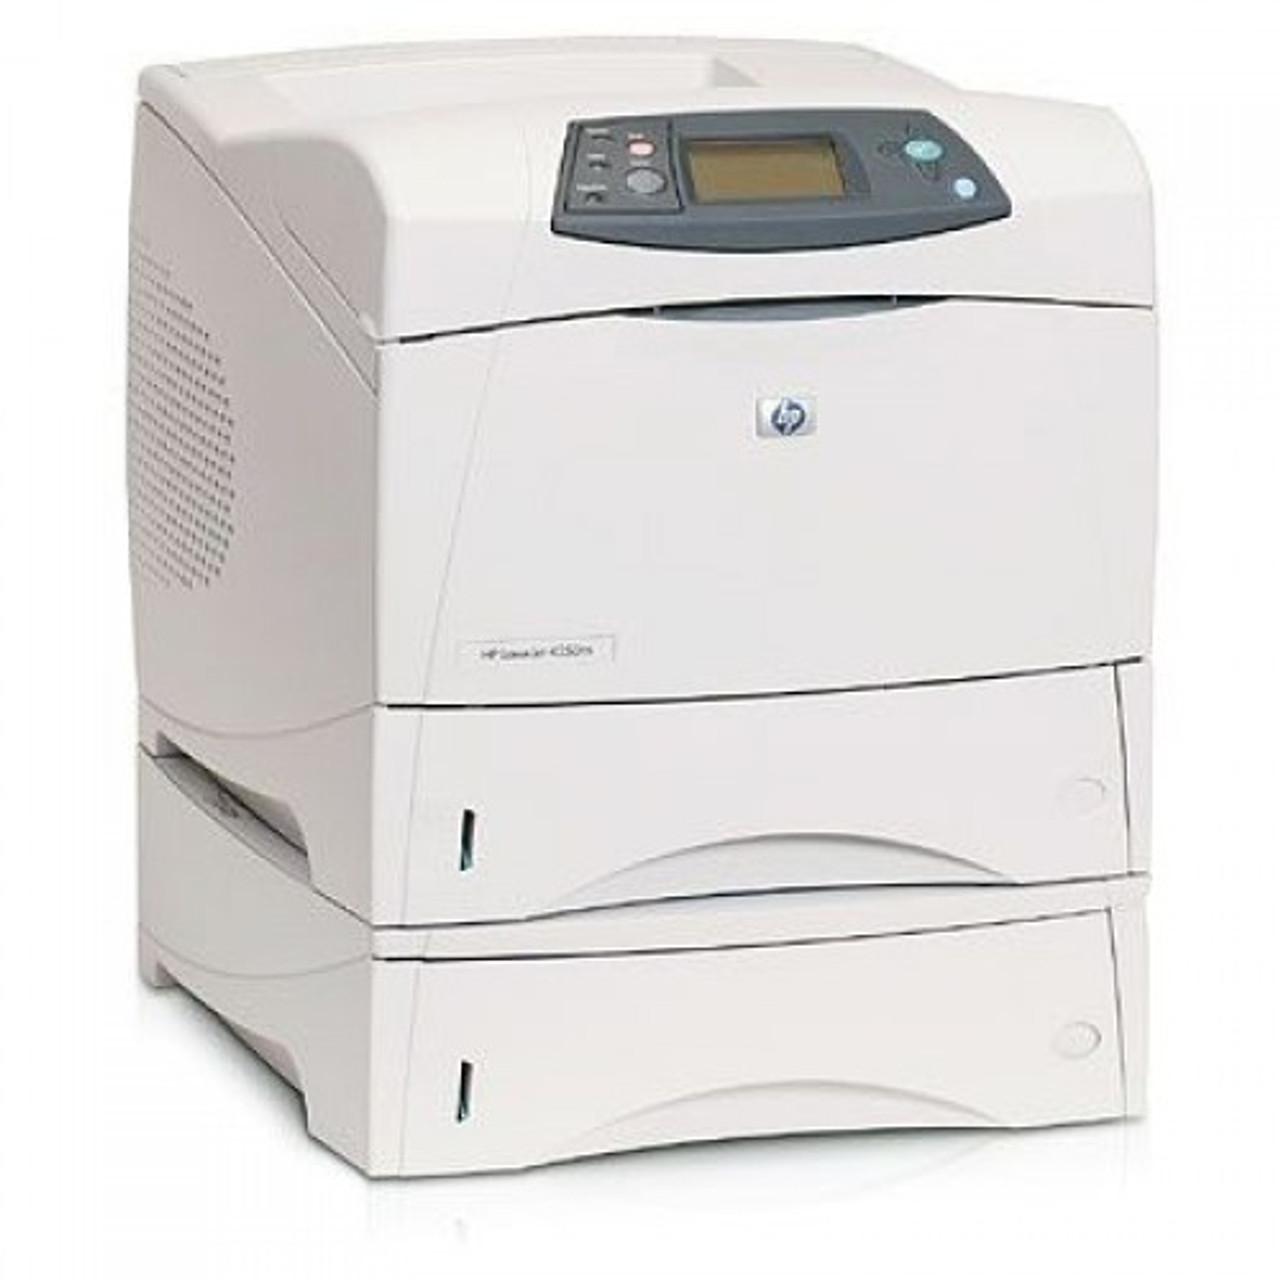 HP LaserJet 4350tn - Q5408AR#ABA - HP Laser Printer for sale